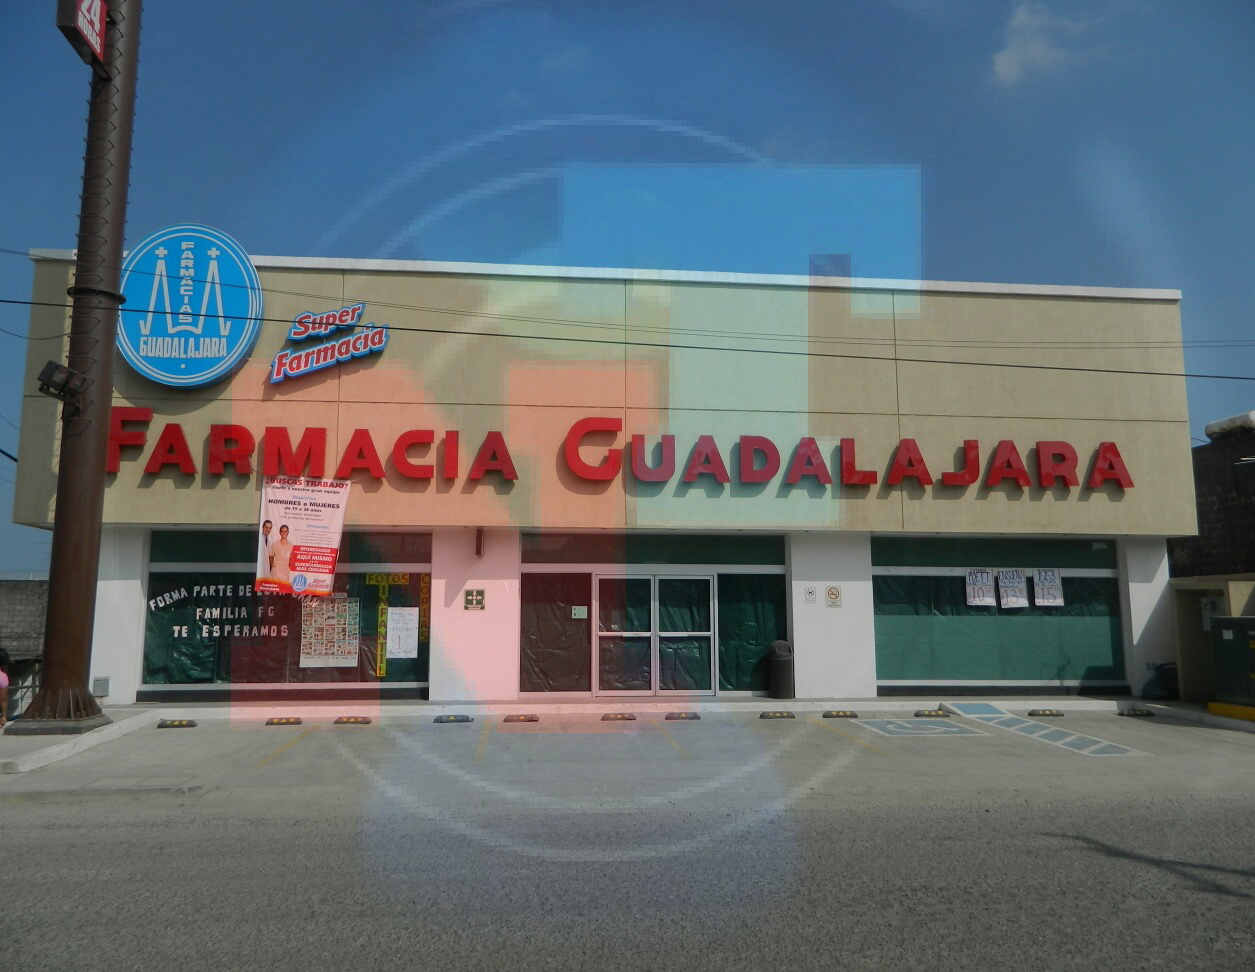 Farmacia Guadalajara cierran por temor a saqueó